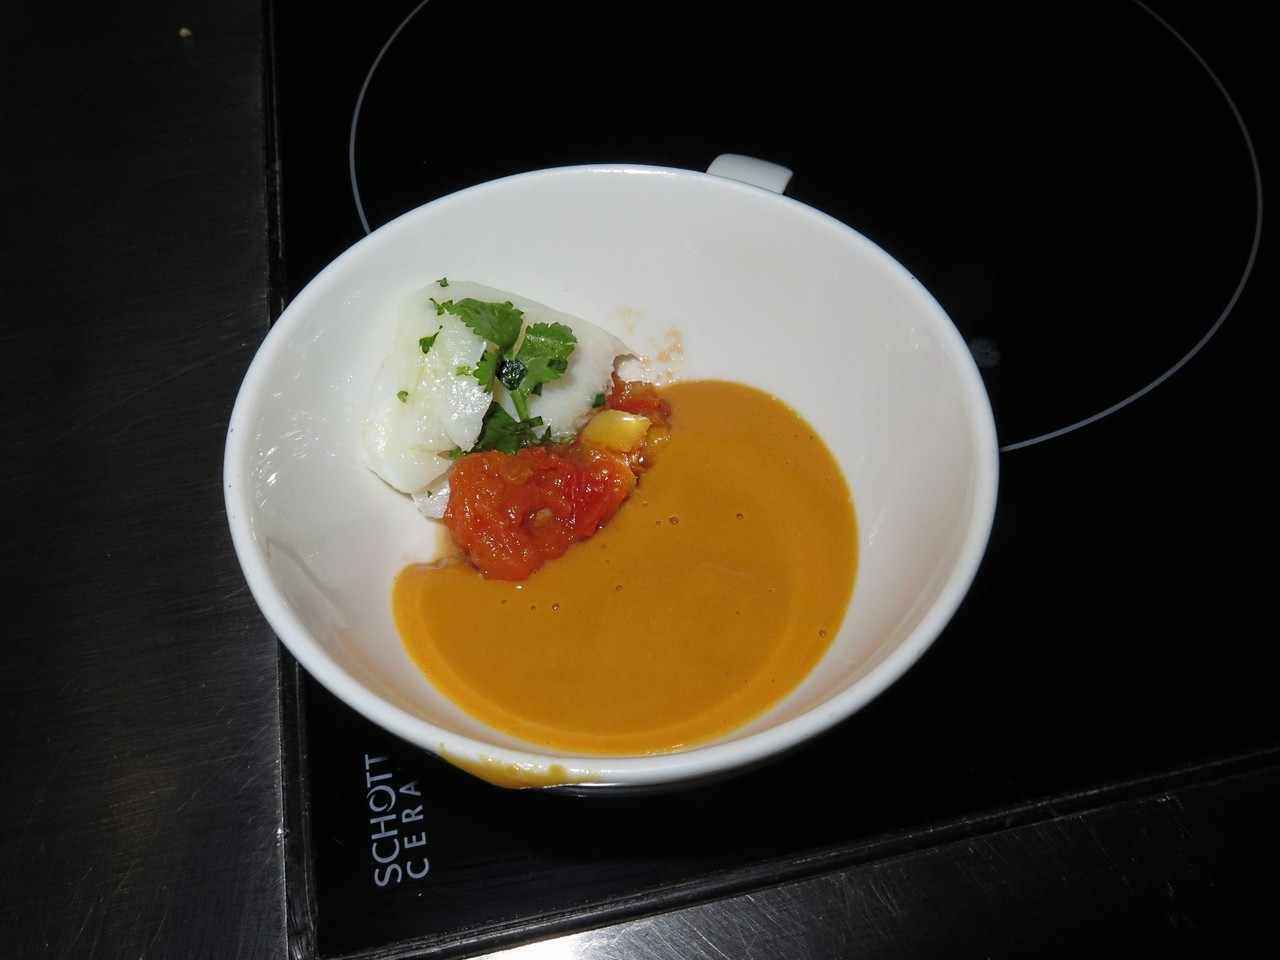 Pumpkin soup / Foie gras with green curry, tomato jam, diced mango, cod petals